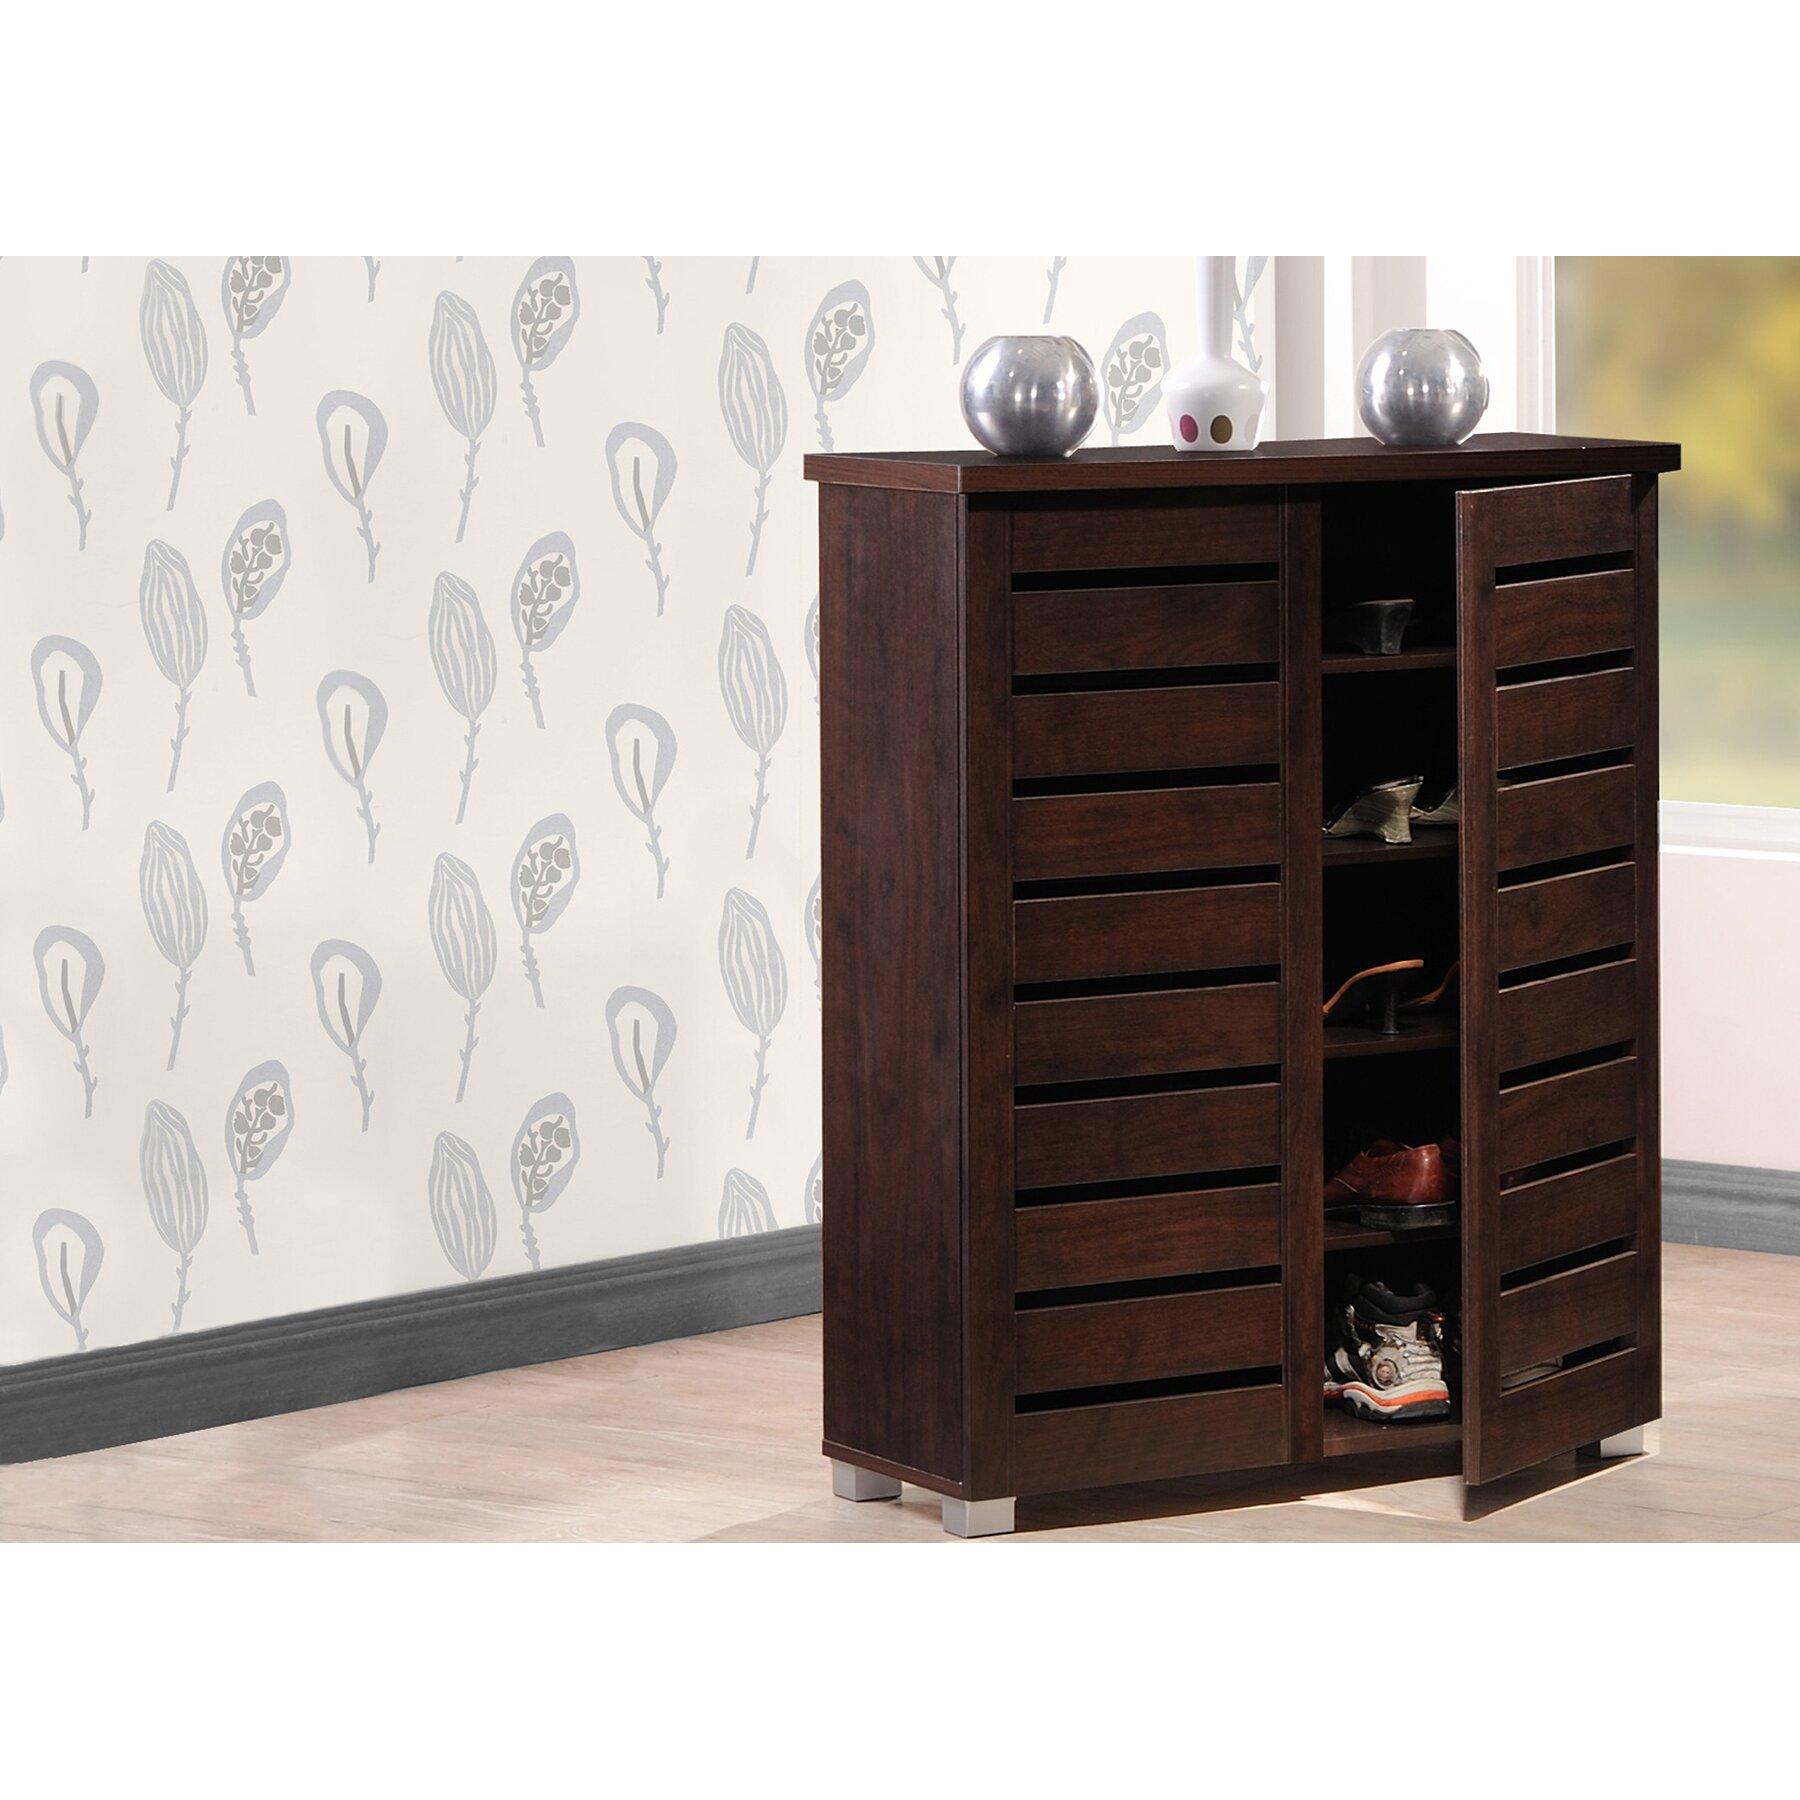 wholesale interiors baxton studio adalwin 15 pair shoe storage cabinet reviews wayfair. Black Bedroom Furniture Sets. Home Design Ideas